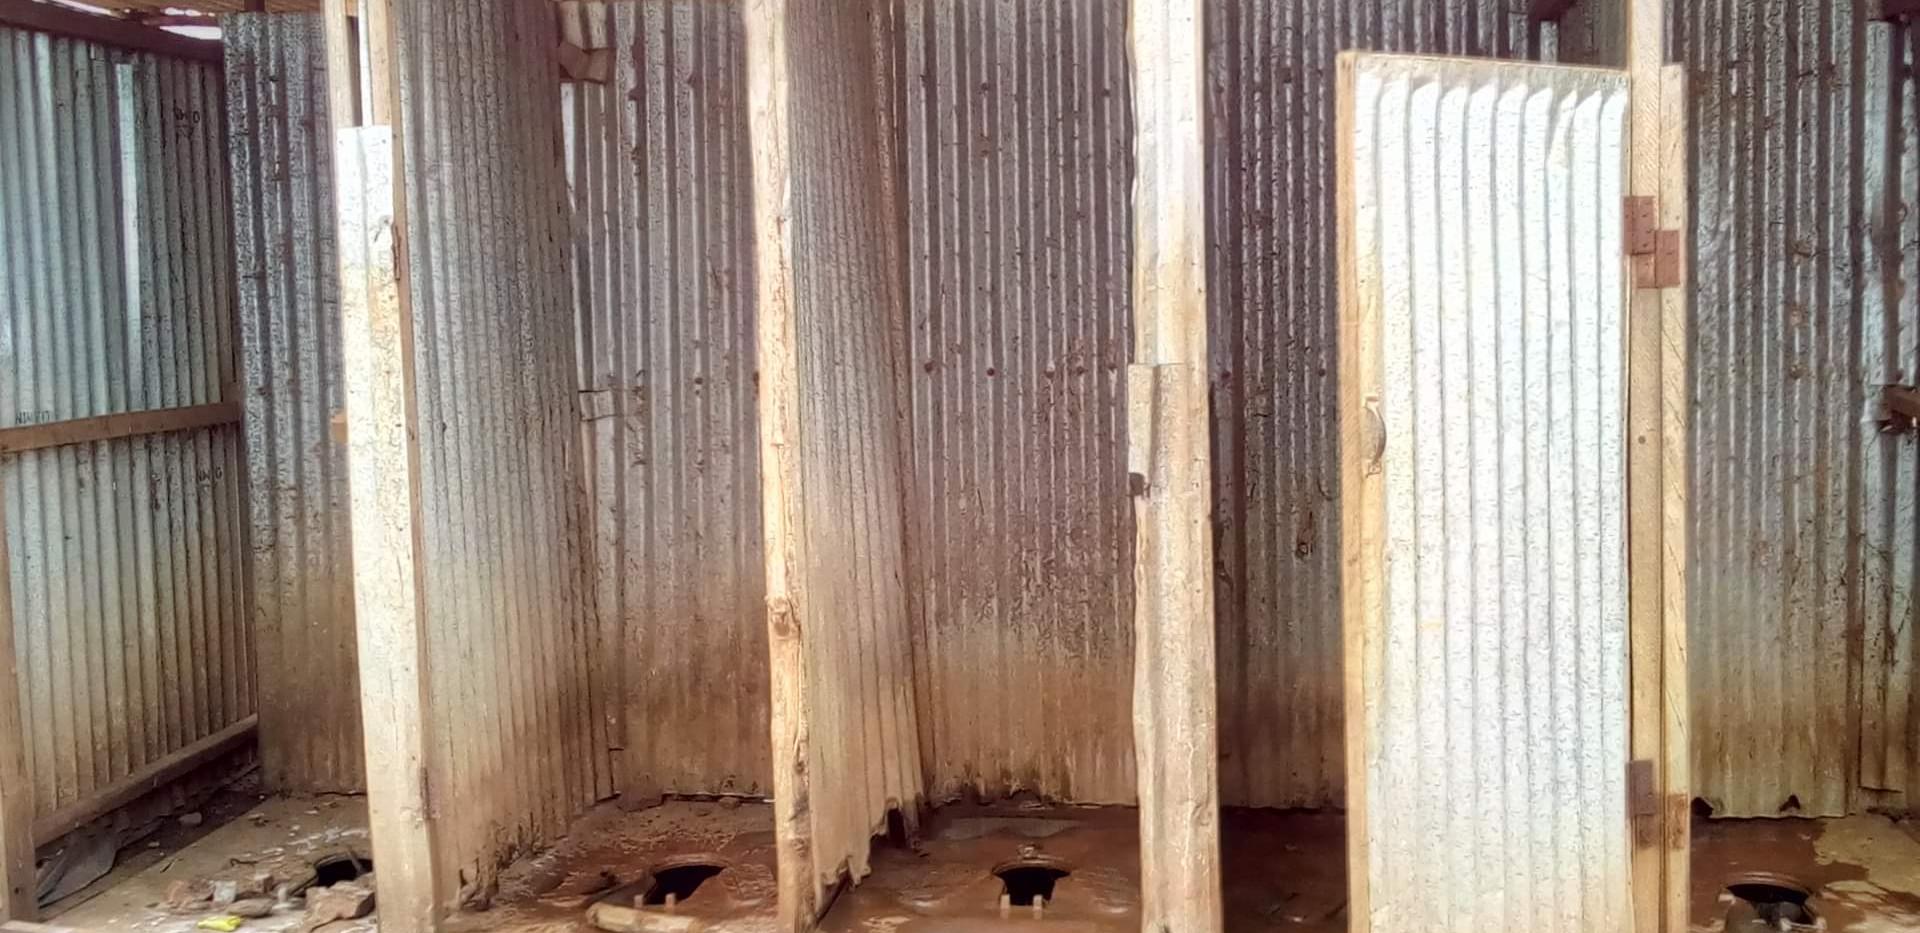 Latrines in Refugees camp in  Ethiopia.j